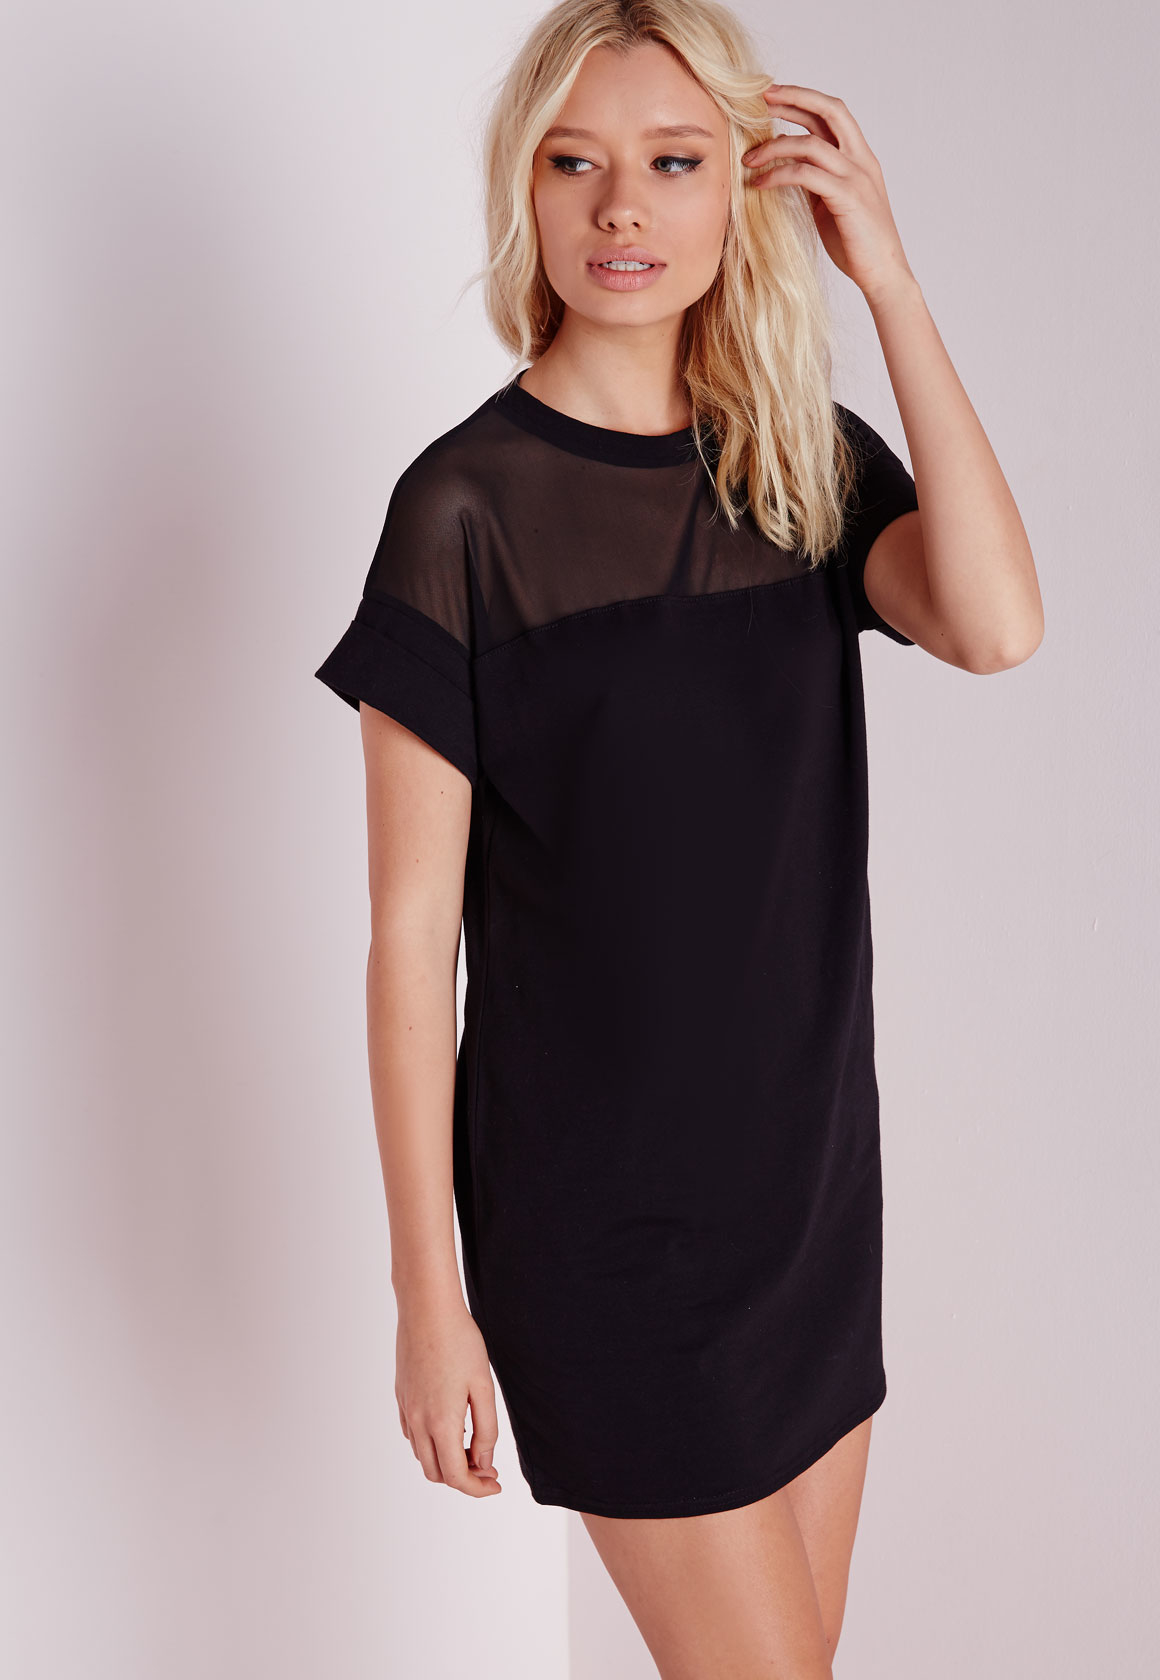 Mesh T-Shirt Dresses